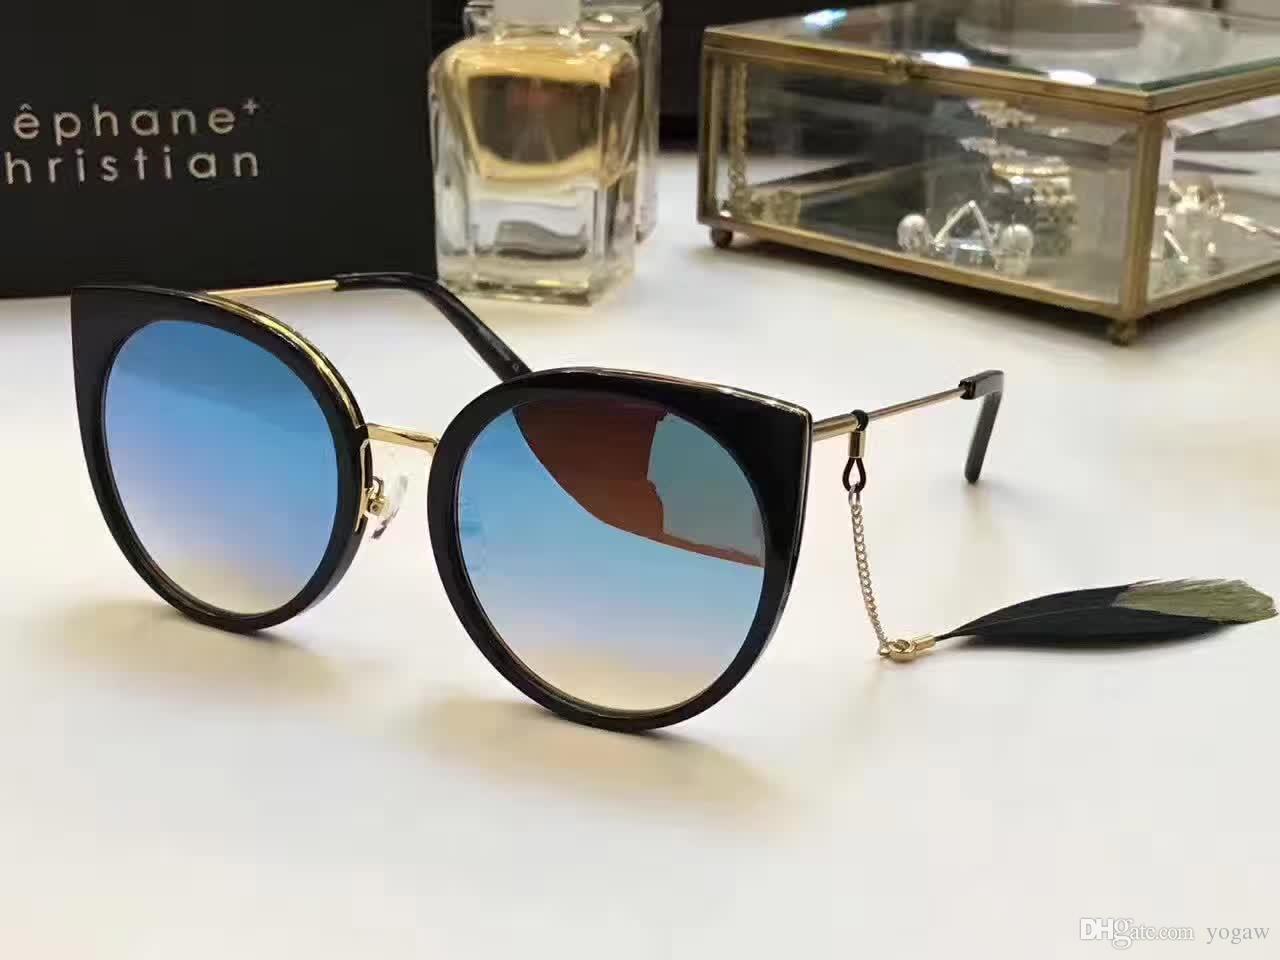 4ca86c9177a9 Stephane Christian Cat Eye Sunglasses Gold Black Blue Len Fashion Eyewear  Designer Brand Sunglasses 2017 Summer New With Box Designer Glasses  Sunglasses Uk ...